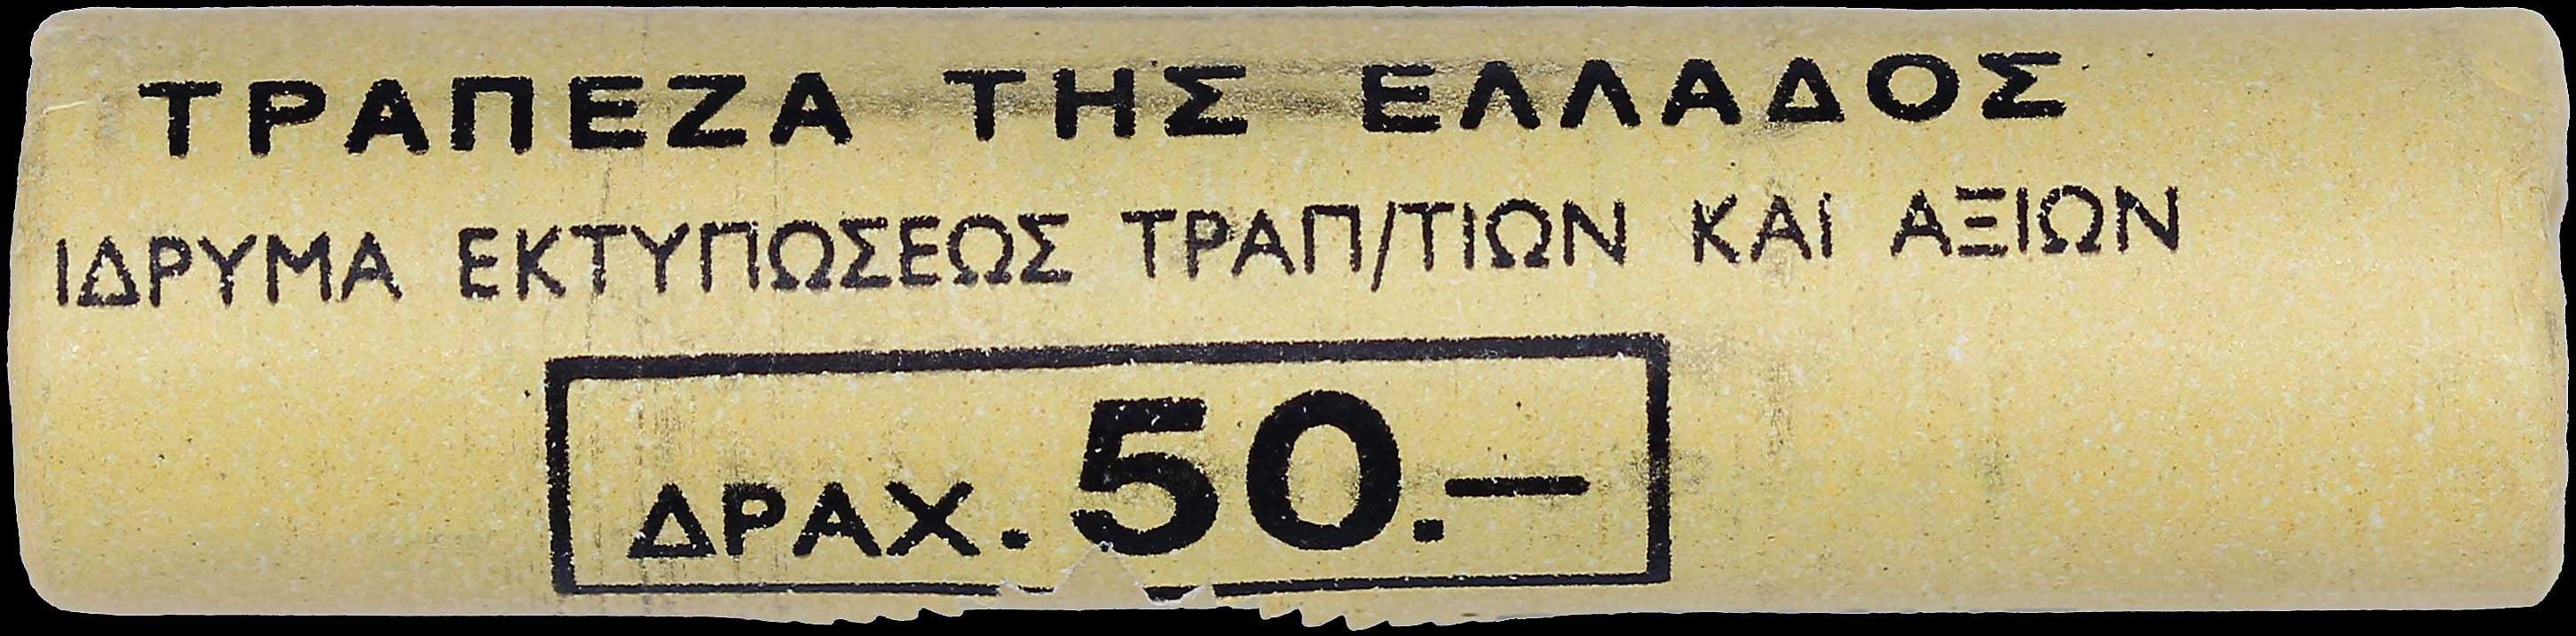 Lot 6234 - -  COINS & TOKENS HELLENIC REPUBLIC & COMMEMORATIVE ISSUES -  A. Karamitsos Public & Live Internet Auction 682 (Part A) Coins, Medals & Banknotes